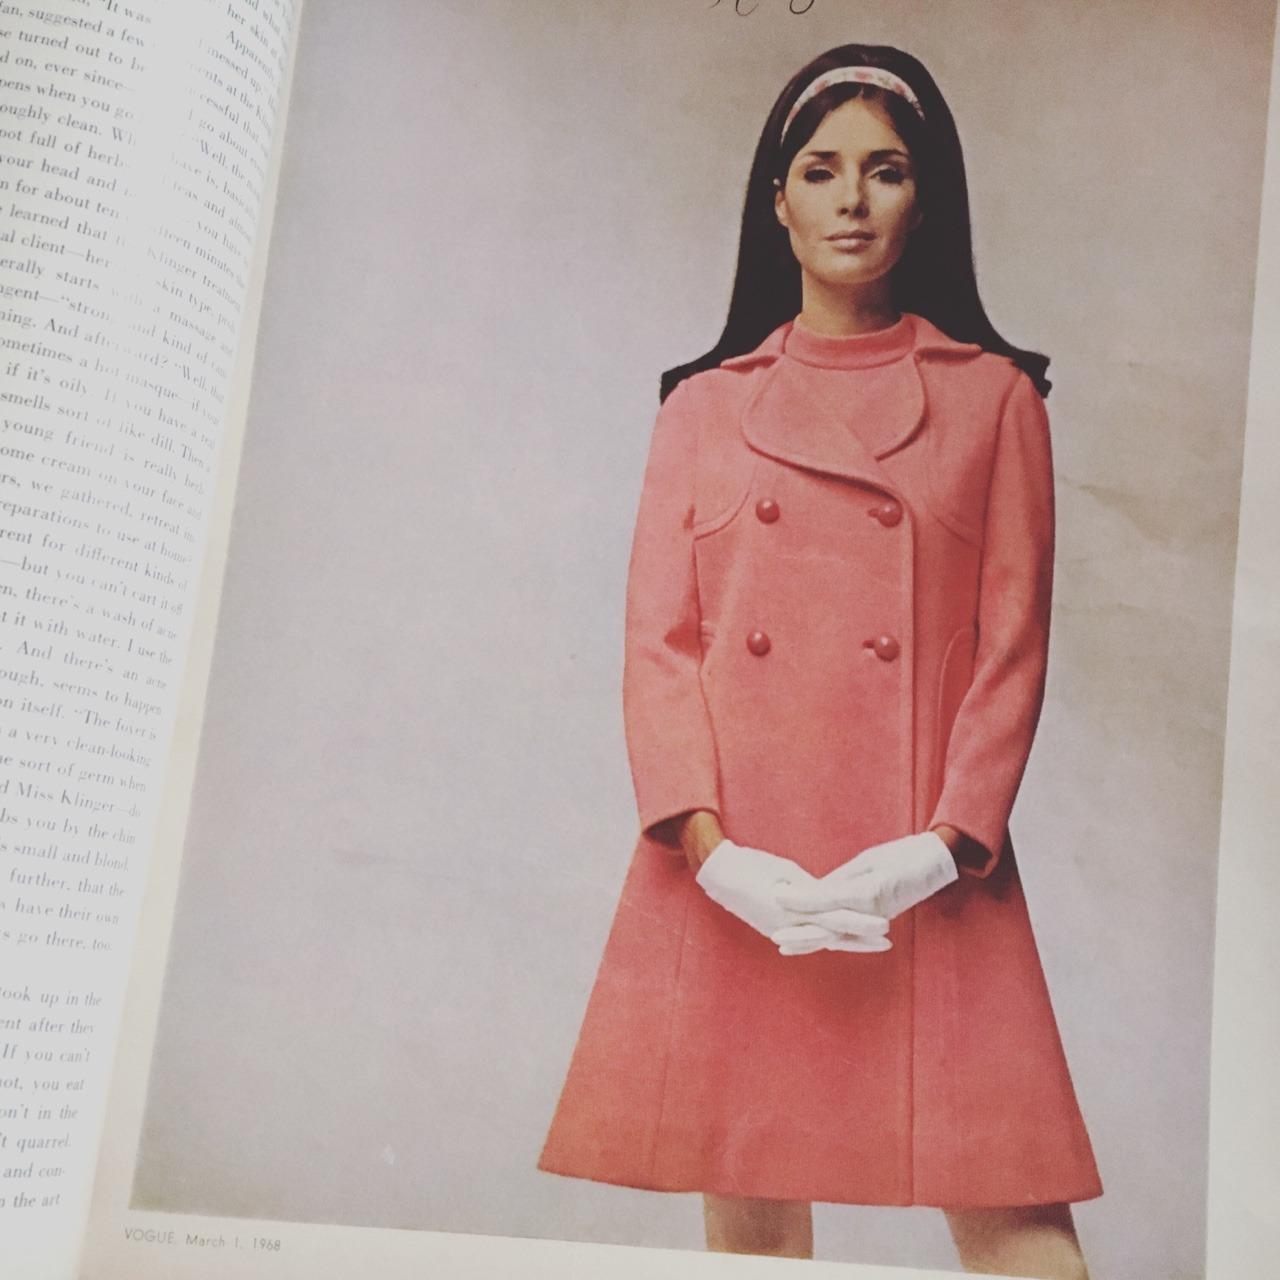 Vogue. March 1968.